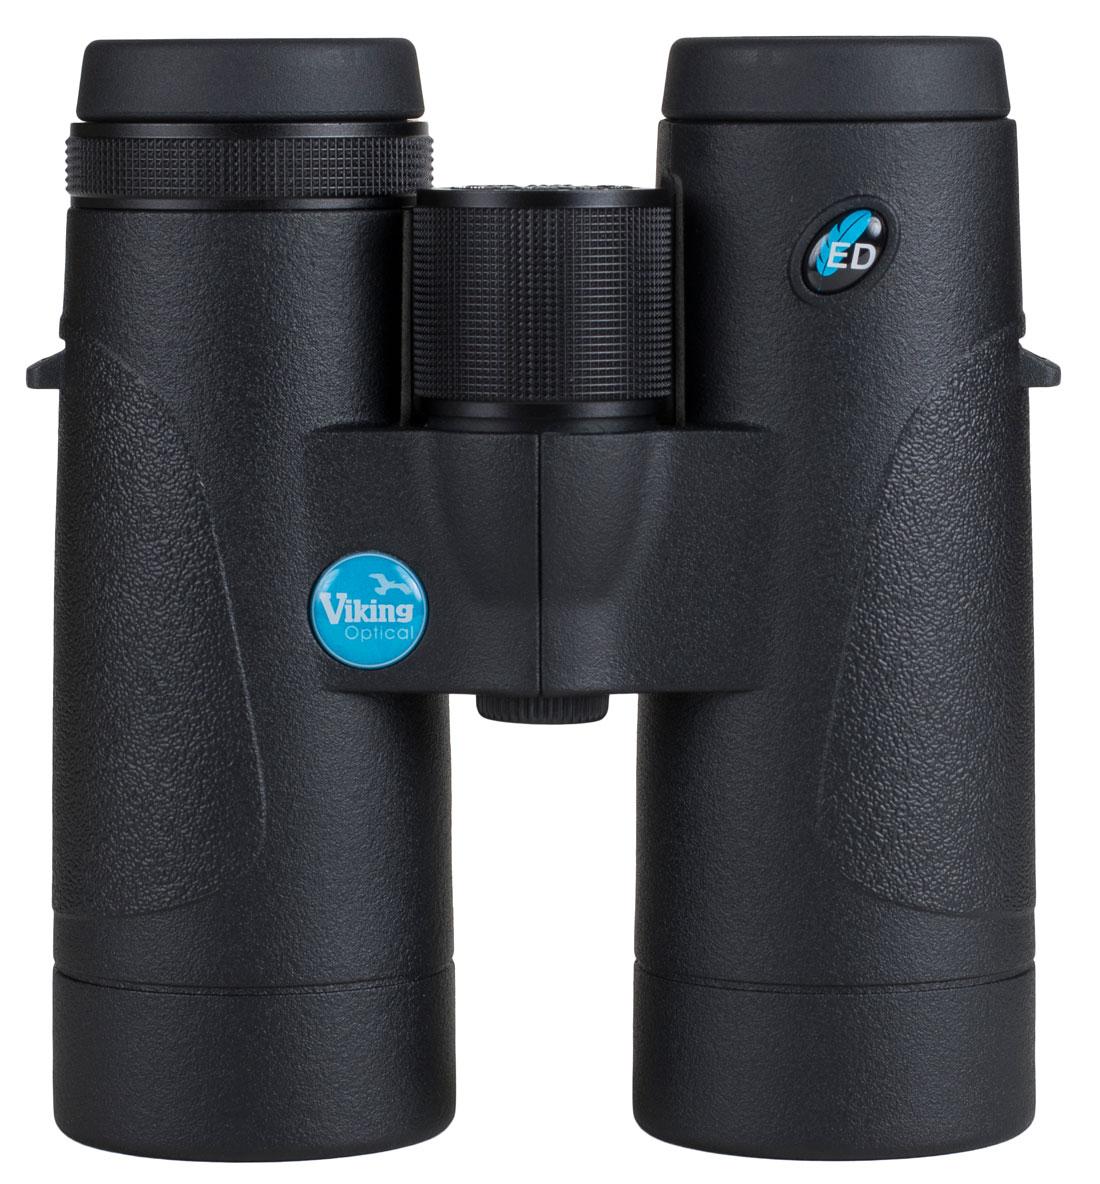 Viking Merlin ED 8x42 Binoculars